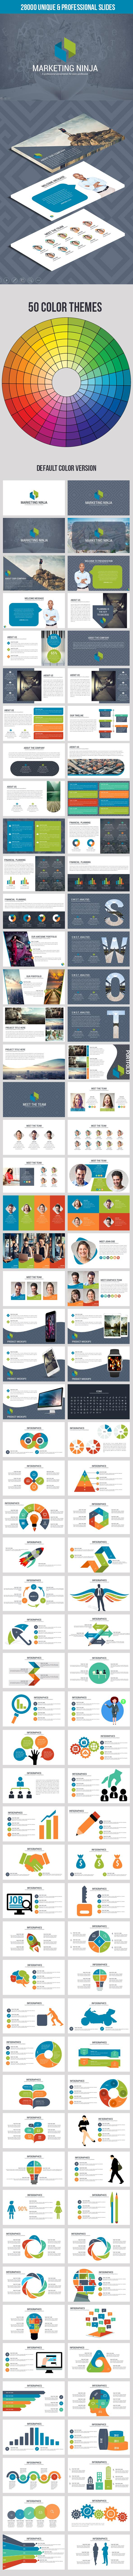 Marketing Ninja Powerpoint Presentation - Business PowerPoint Templates